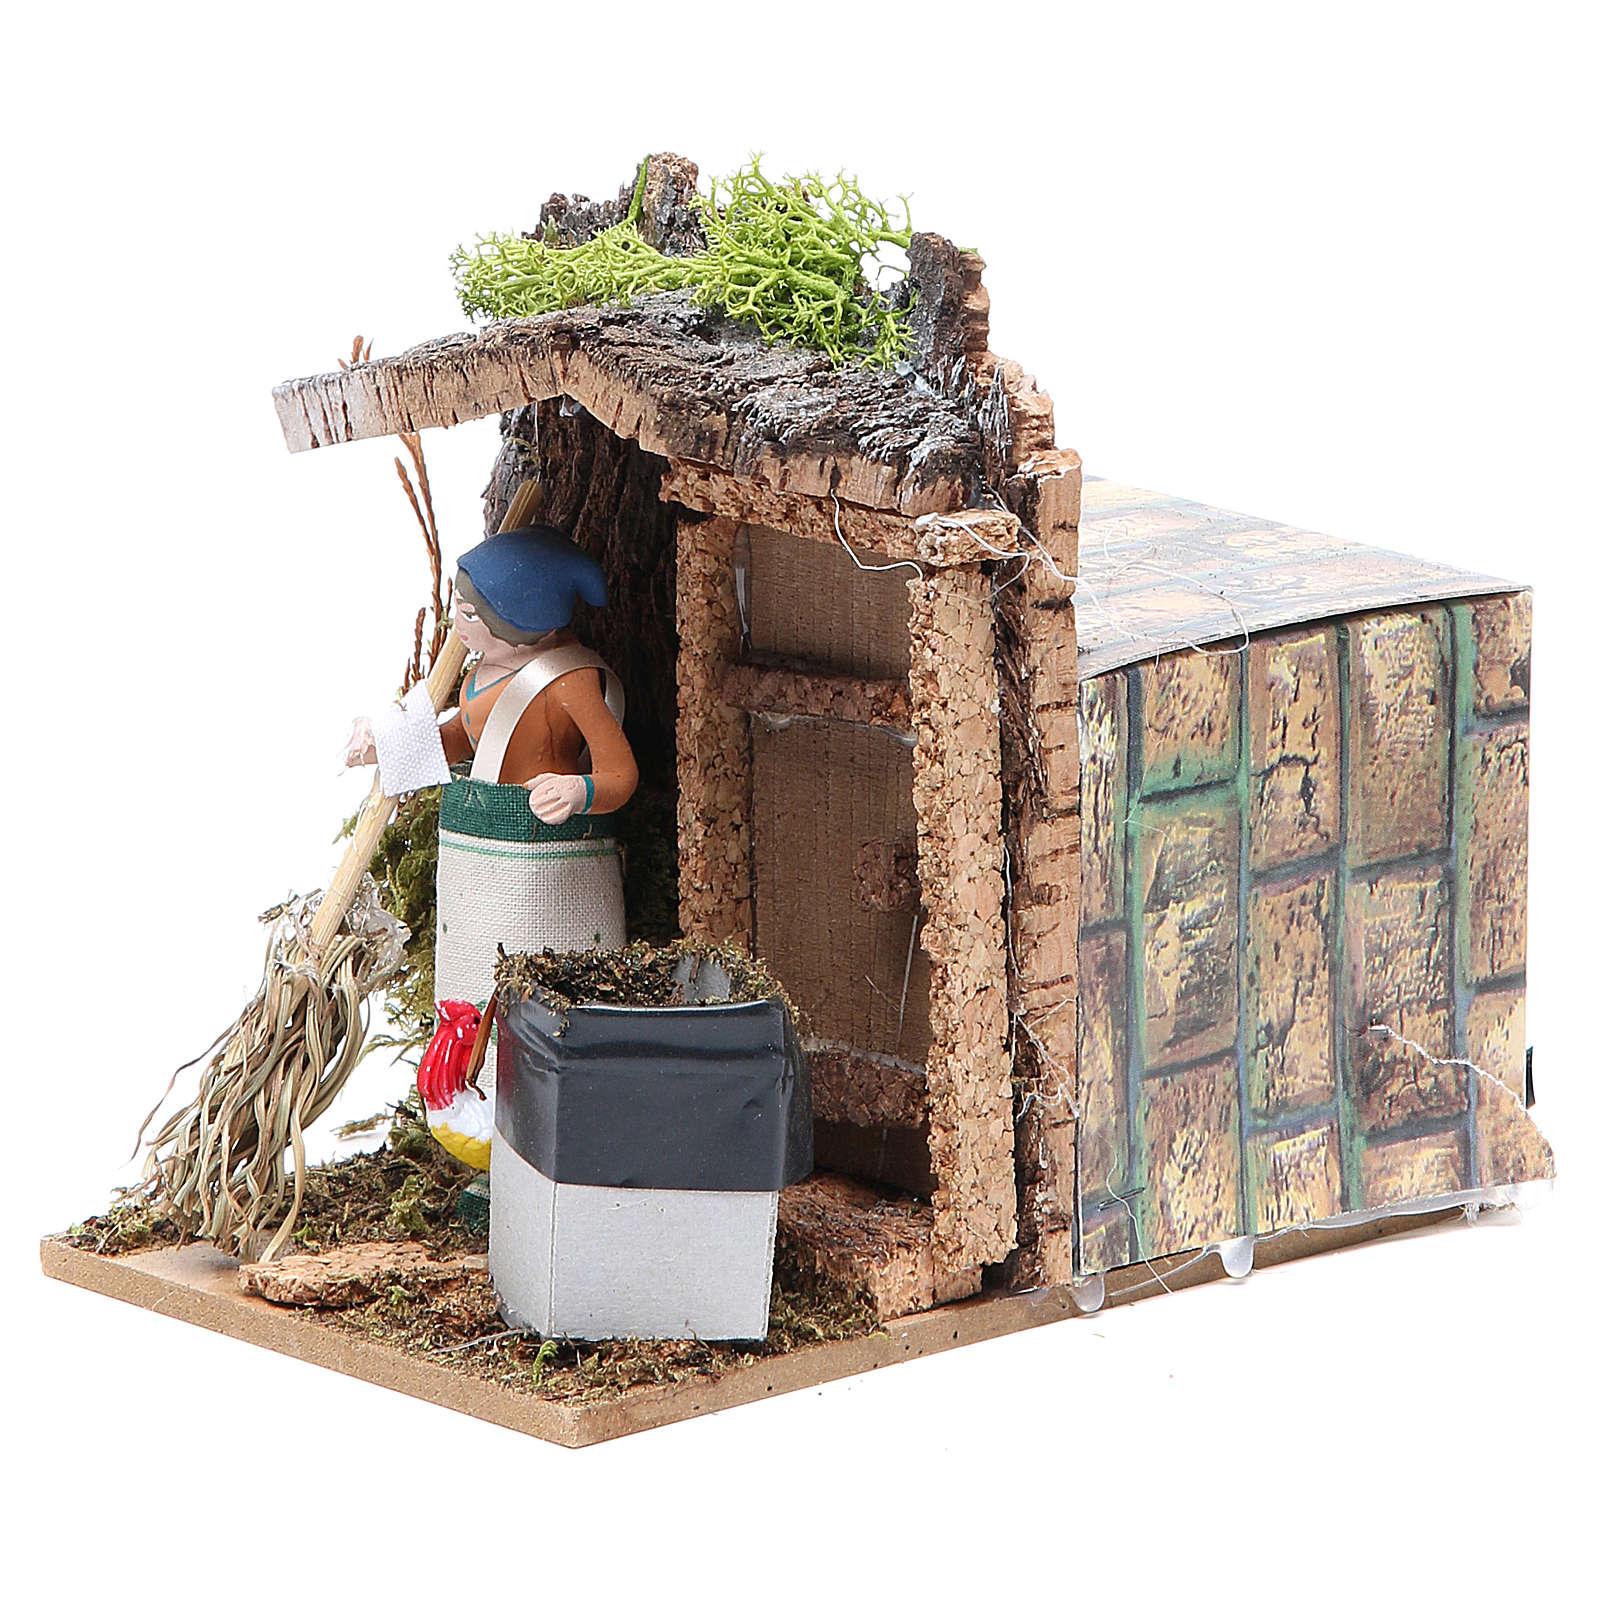 Woman sweeping measuring 7cm, animated nativity figurine 3